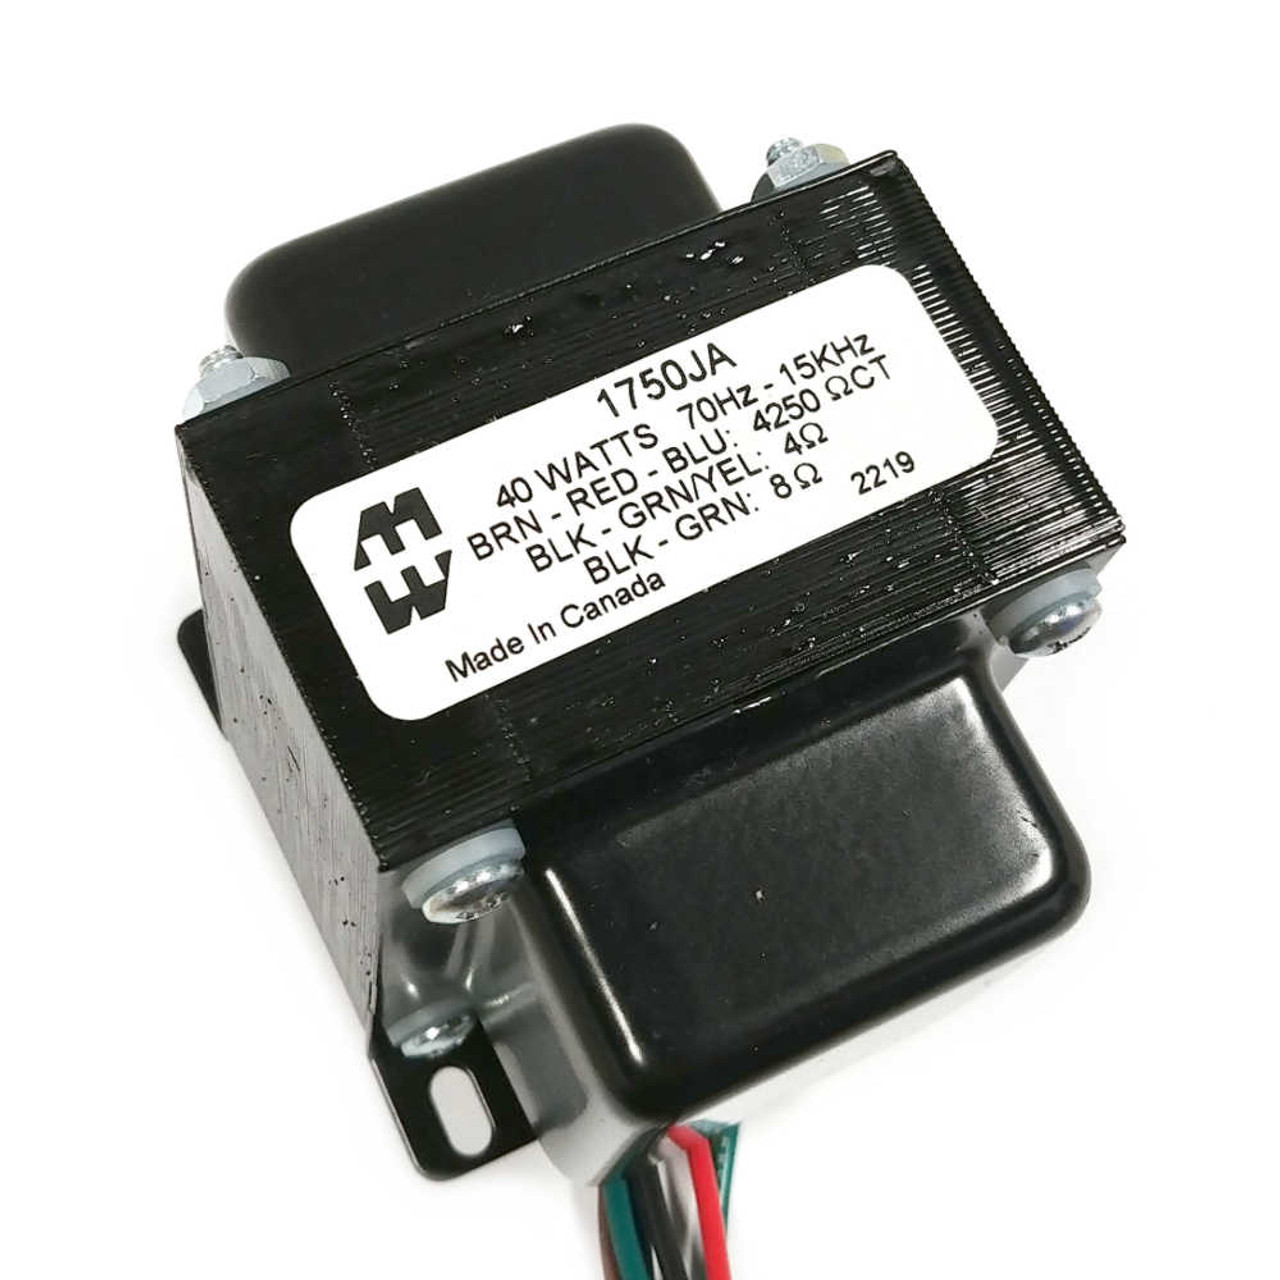 Hammond 1750JA - Output Transformer - 4.25K, 4/8 OHM, PP, 40W